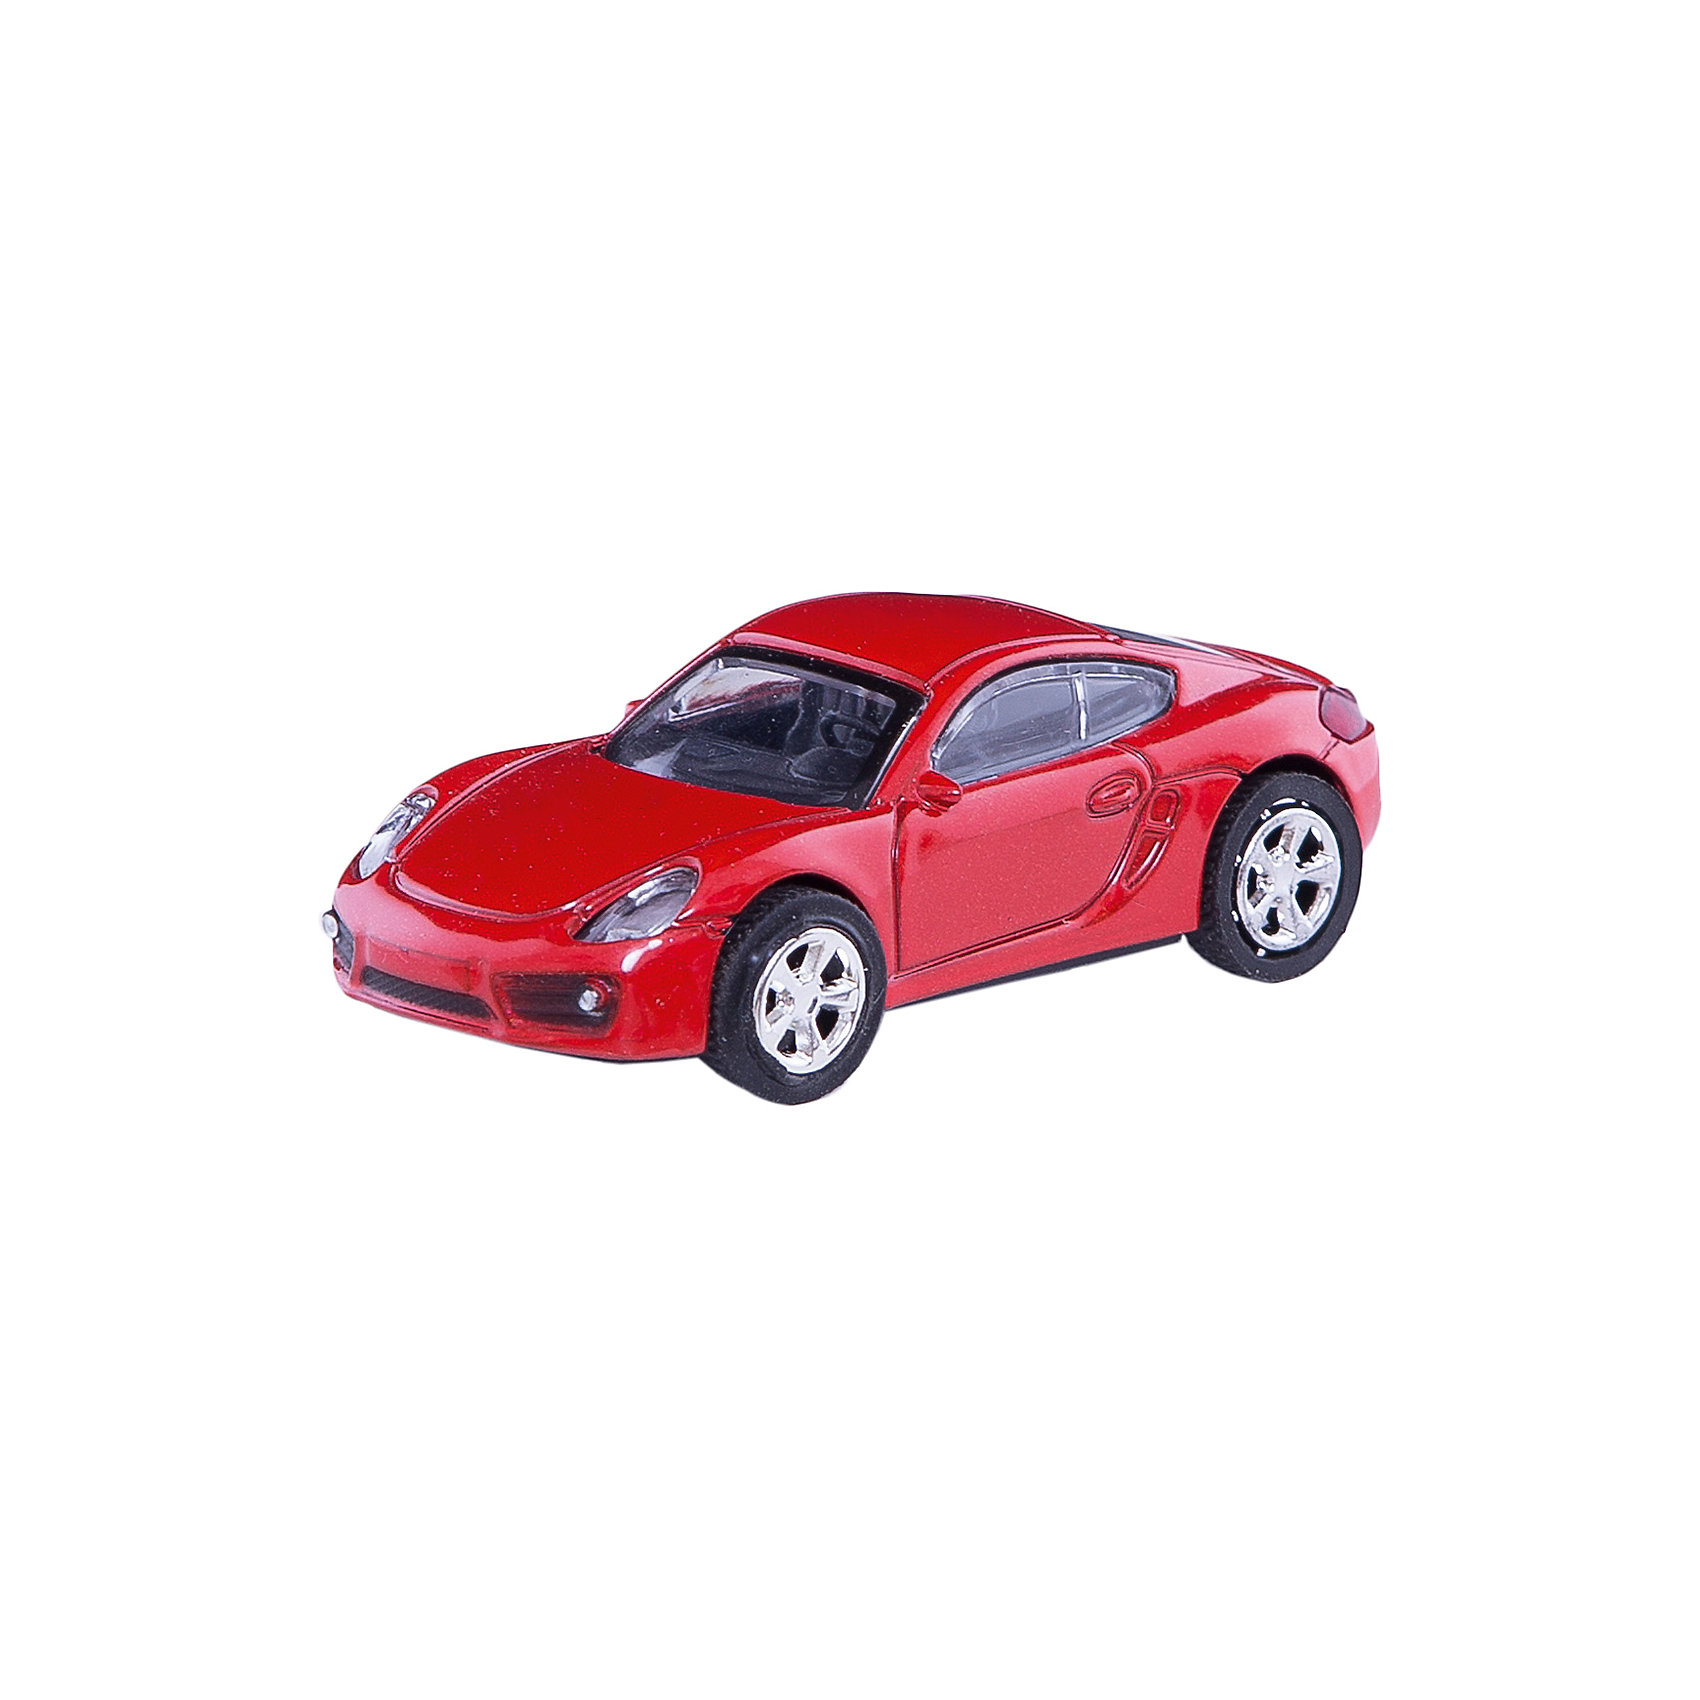 Машинка Germany Sport Coupe со светом фар 1:43, AutotimeМашинки<br><br><br>Ширина мм: 165<br>Глубина мм: 57<br>Высота мм: 75<br>Вес г: 13<br>Возраст от месяцев: 36<br>Возраст до месяцев: 2147483647<br>Пол: Мужской<br>Возраст: Детский<br>SKU: 5584034